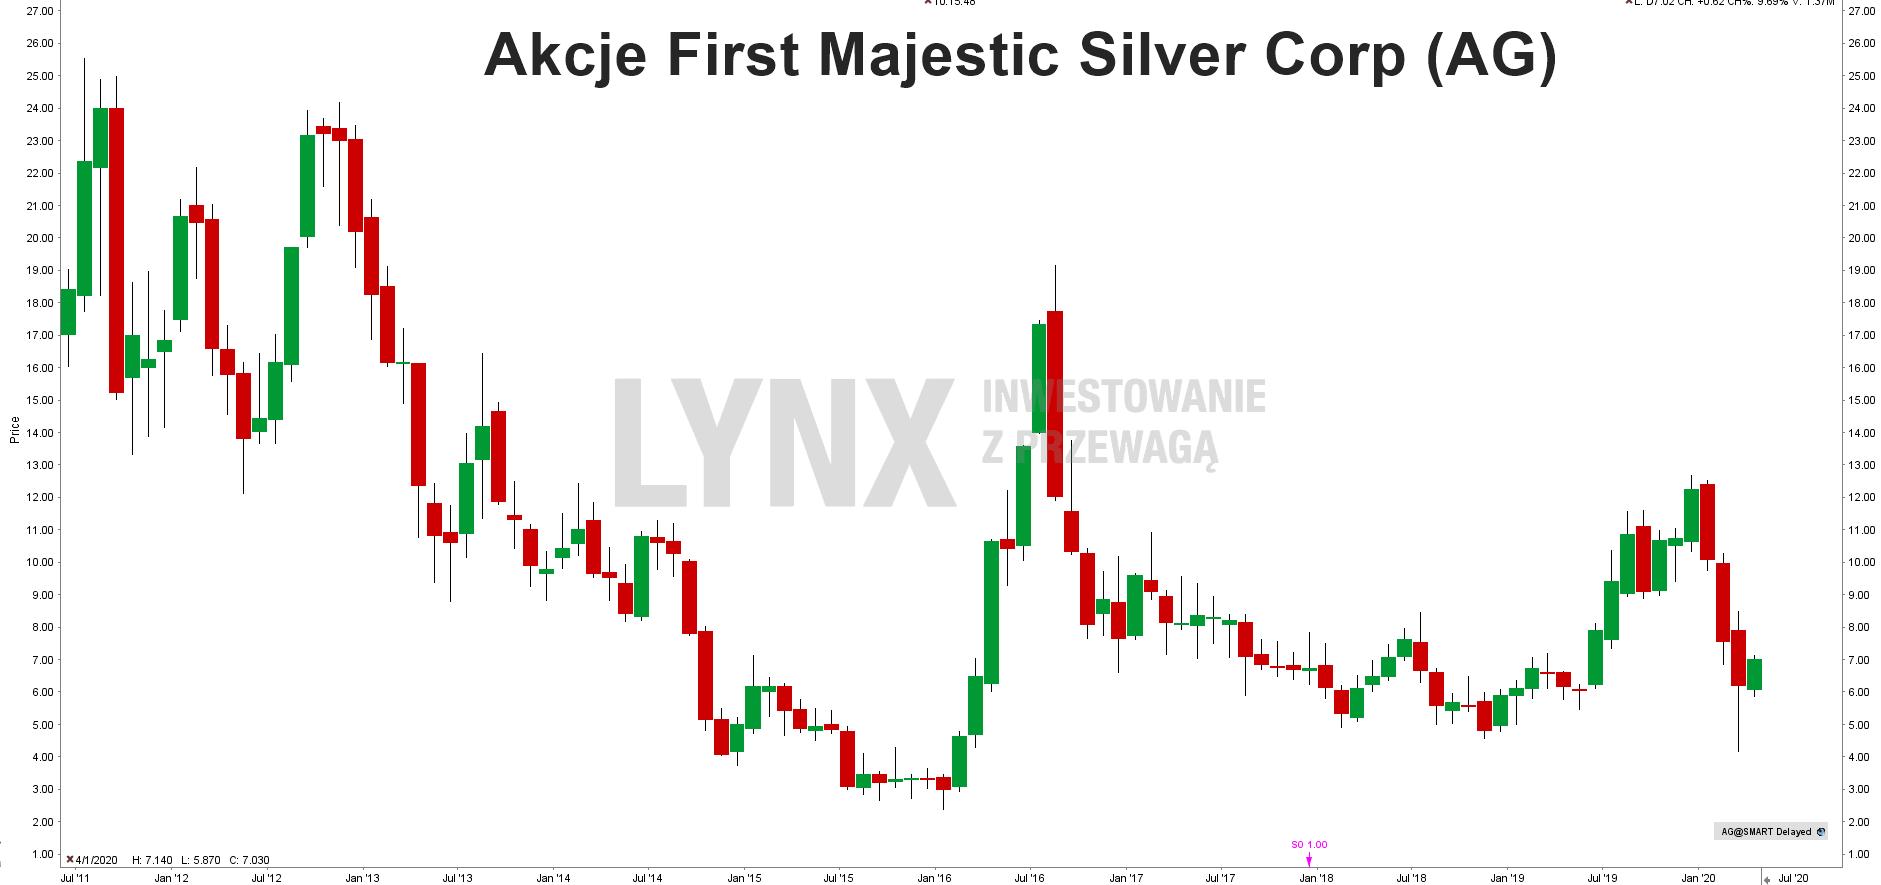 AkcjeFirst Majestic Silver Corp (AG)